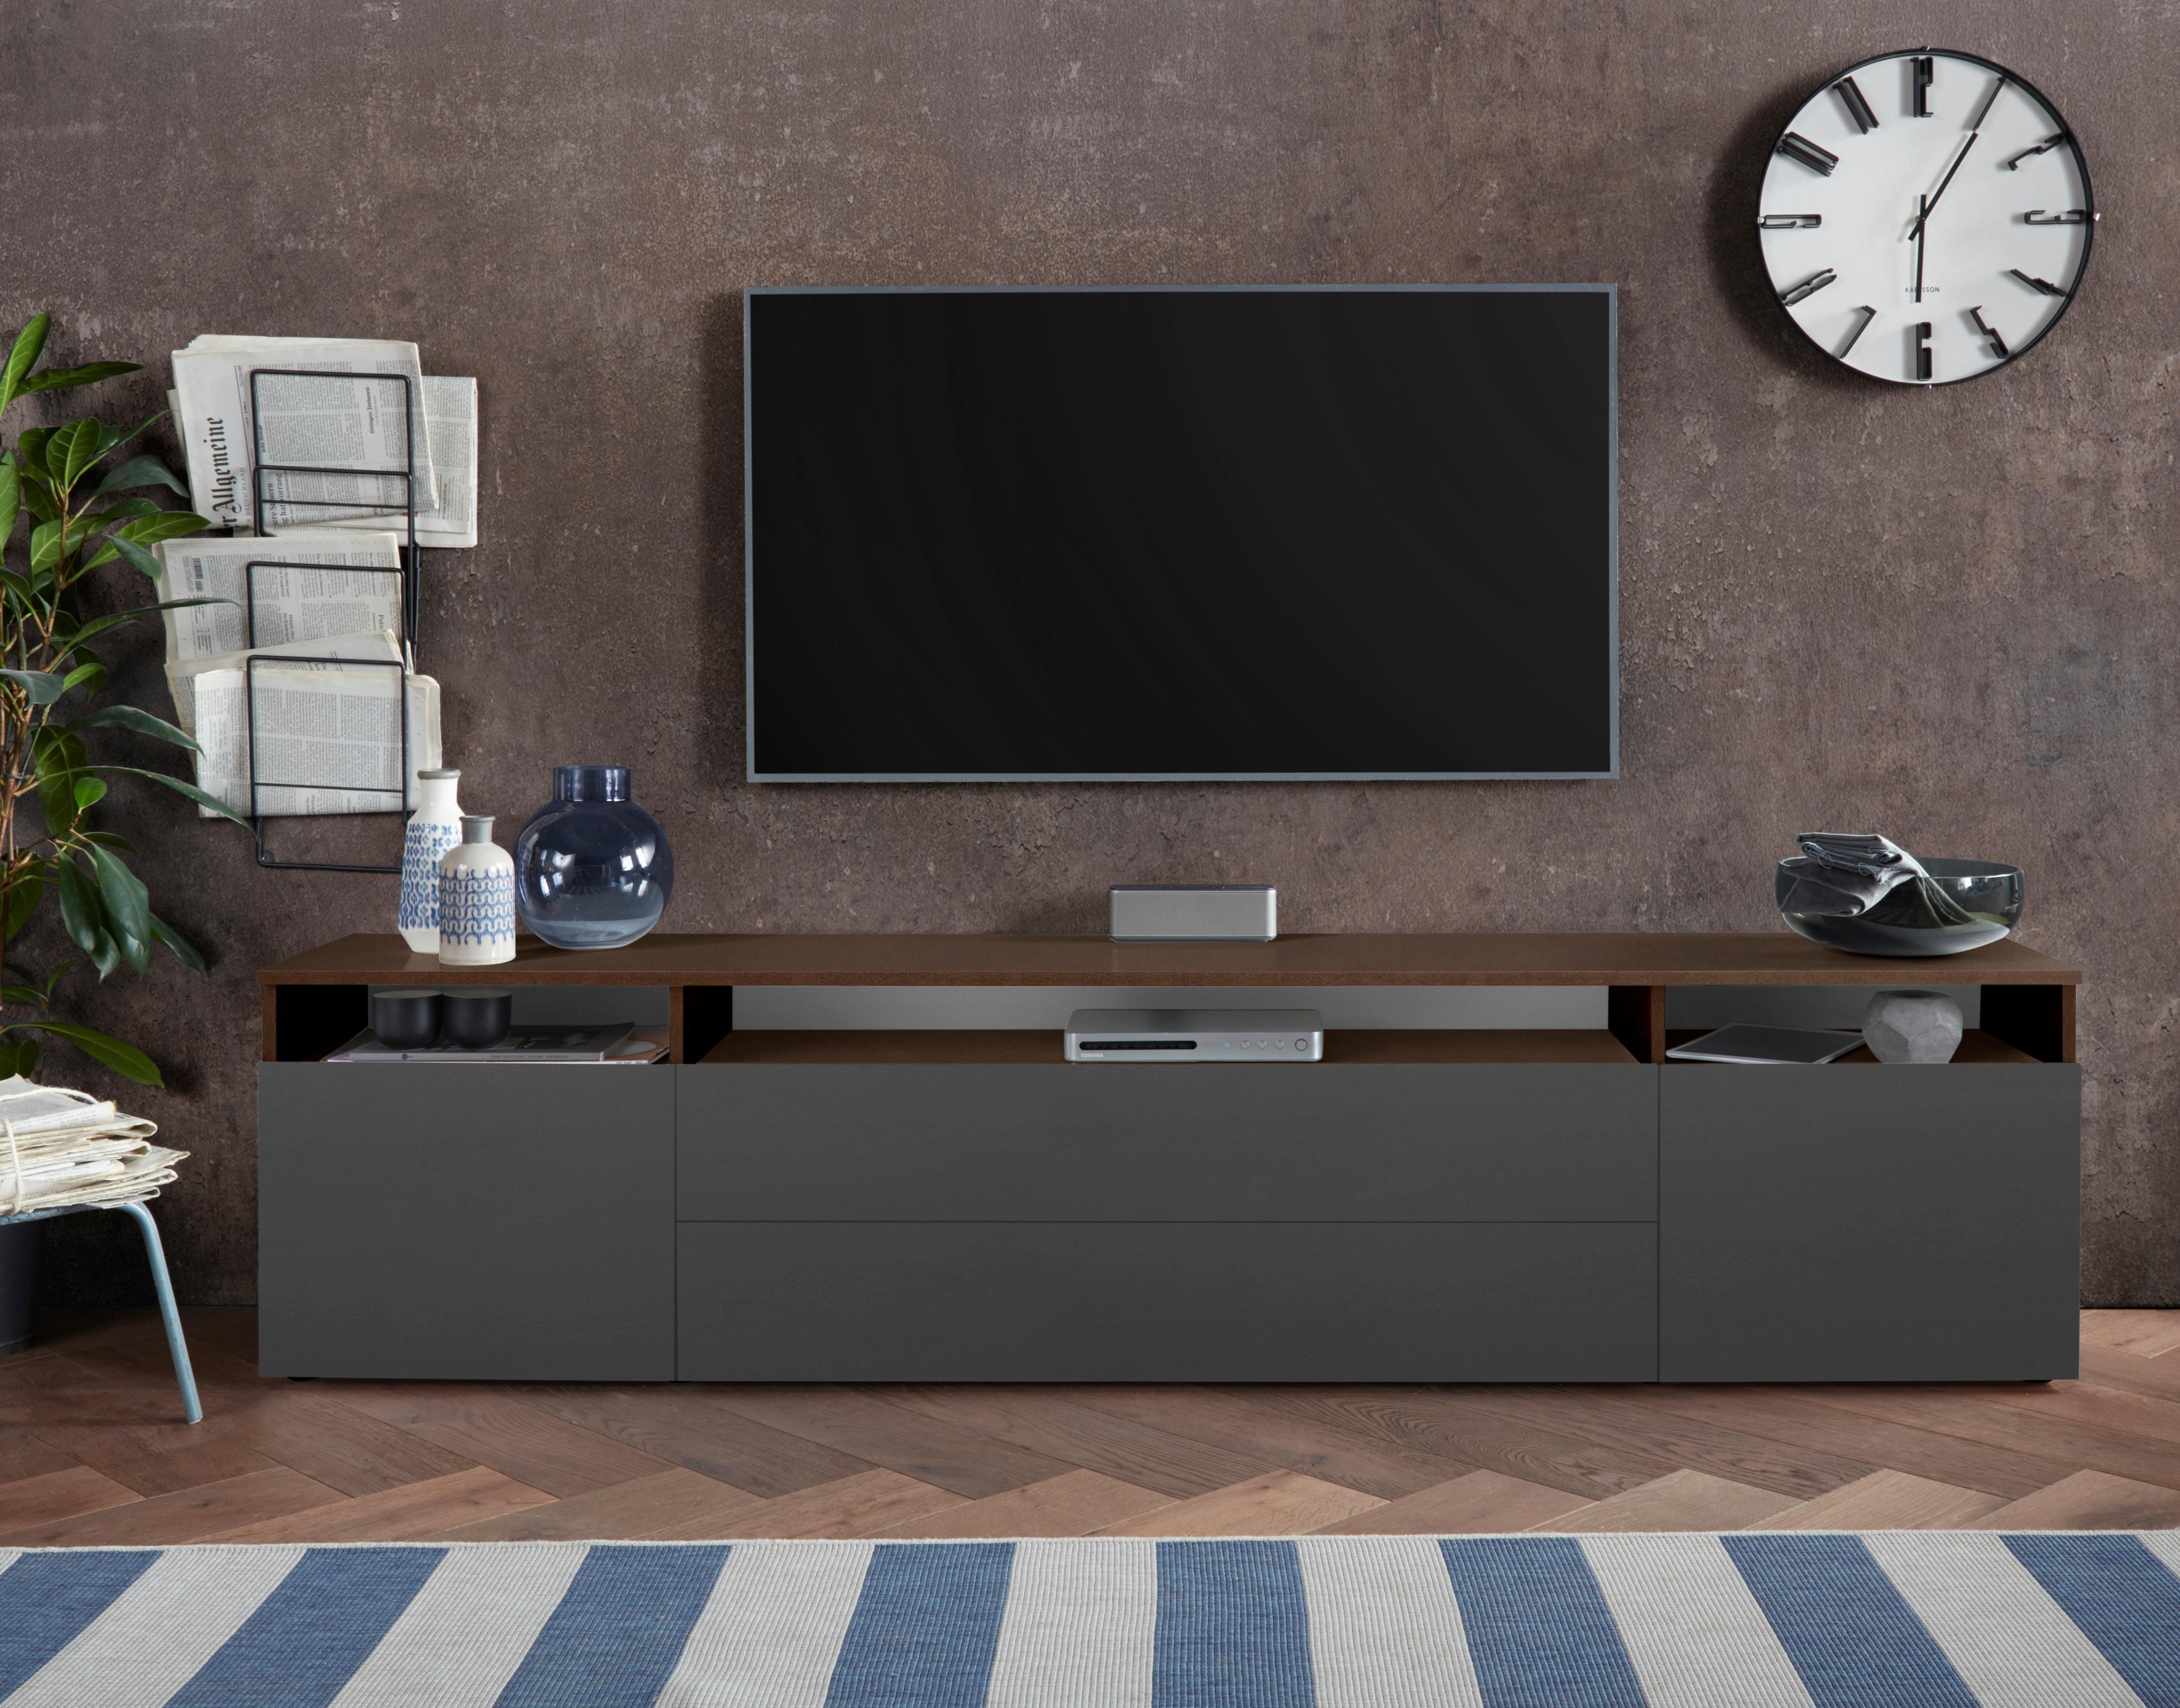 borchardt Möbel tv-meubel Melbourne , breedte 200 cm online kopen op otto.nl